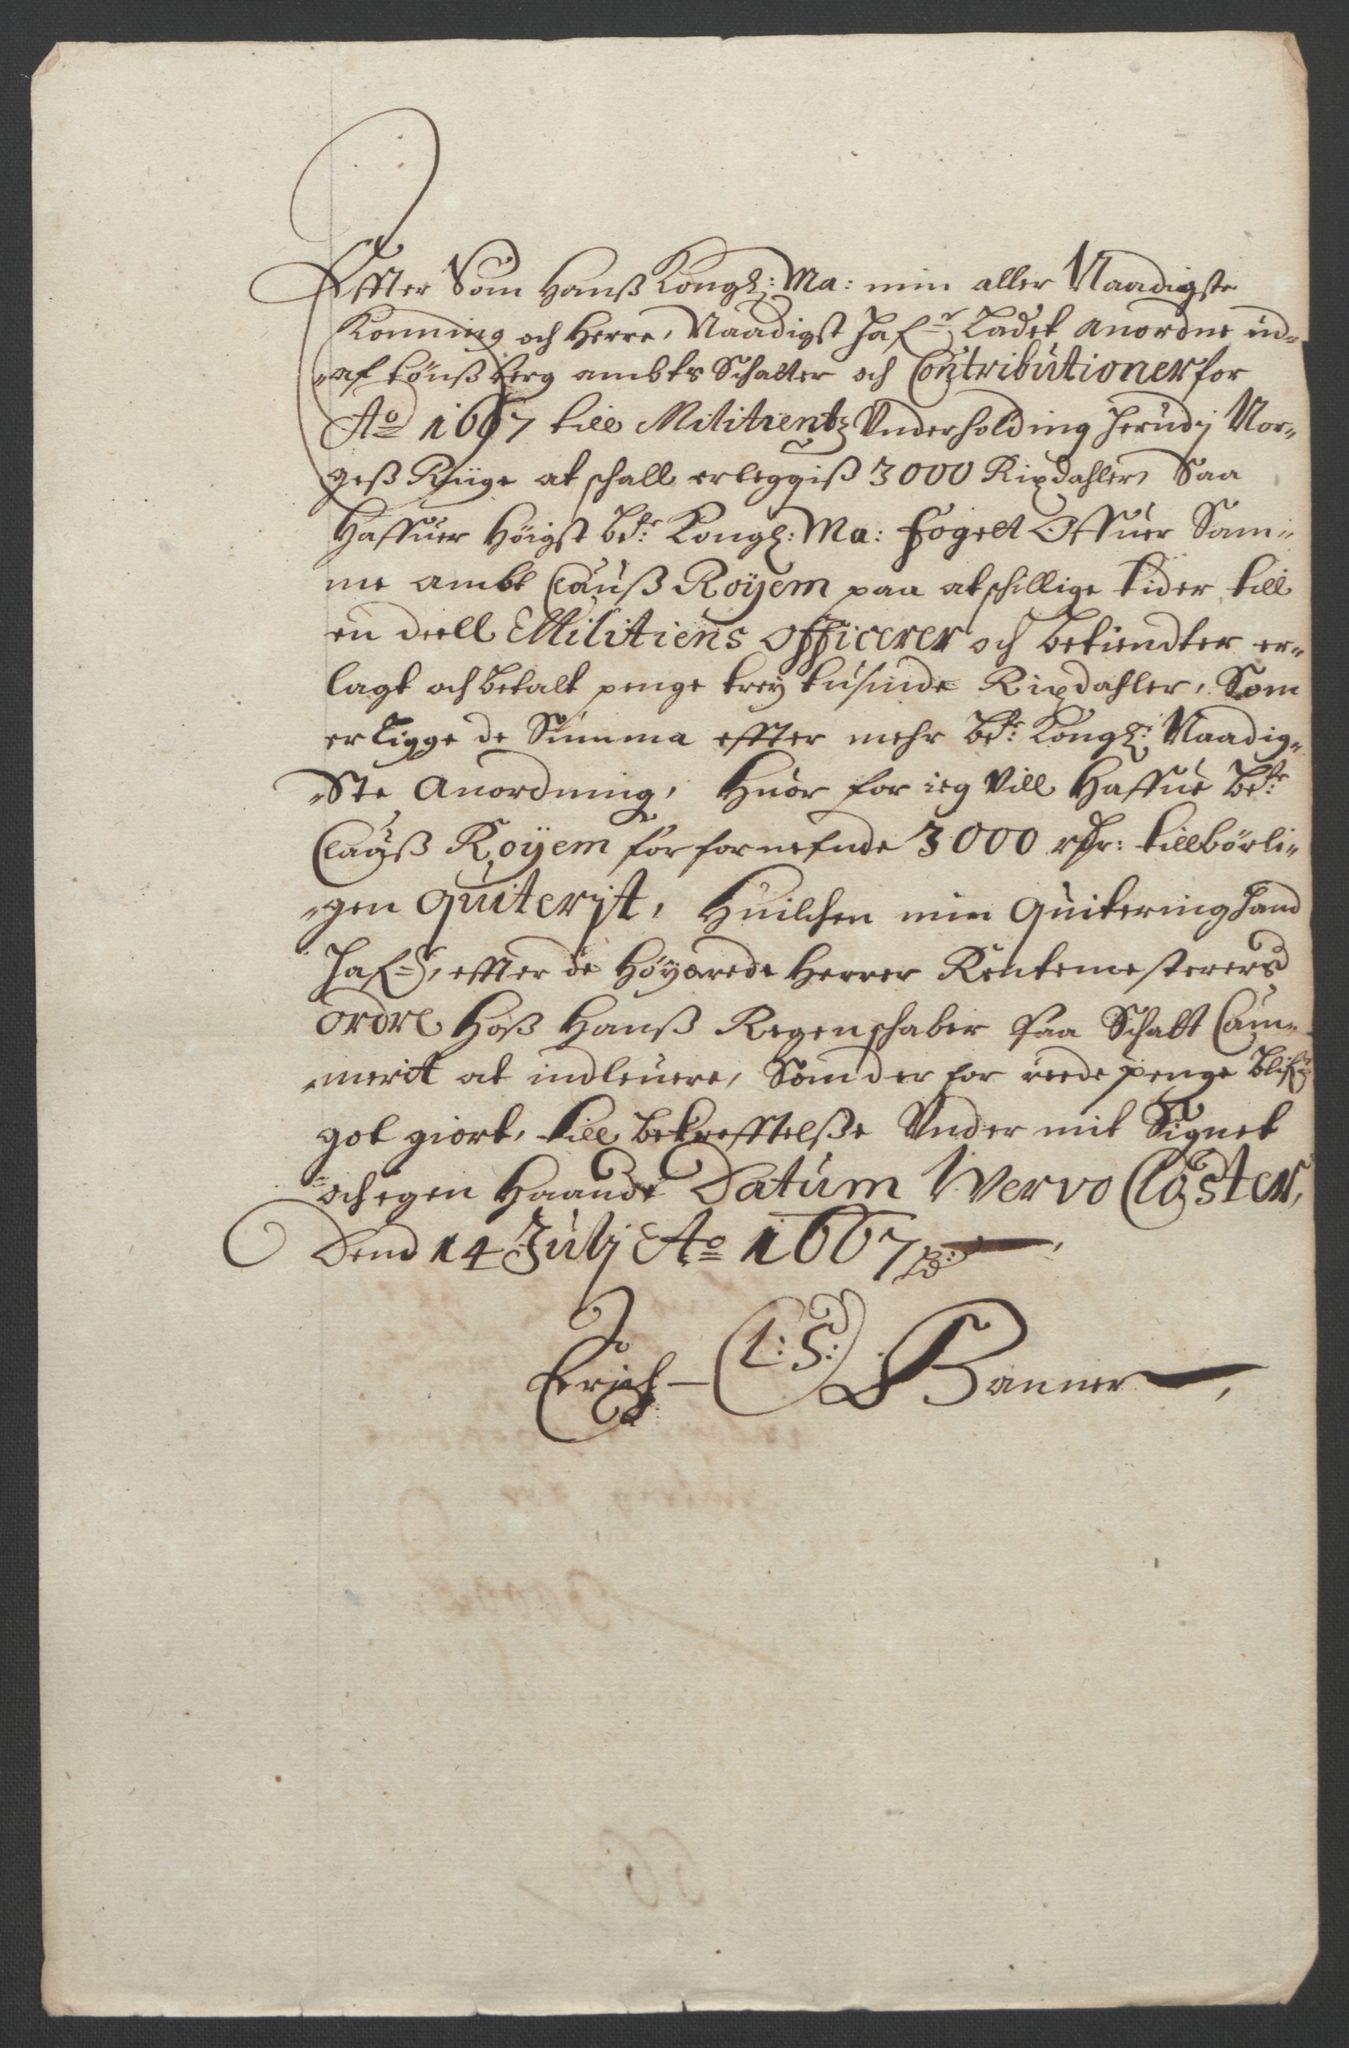 RA, Rentekammeret inntil 1814, Reviderte regnskaper, Fogderegnskap, R32/L1842: Fogderegnskap Jarlsberg grevskap, 1664-1673, s. 83